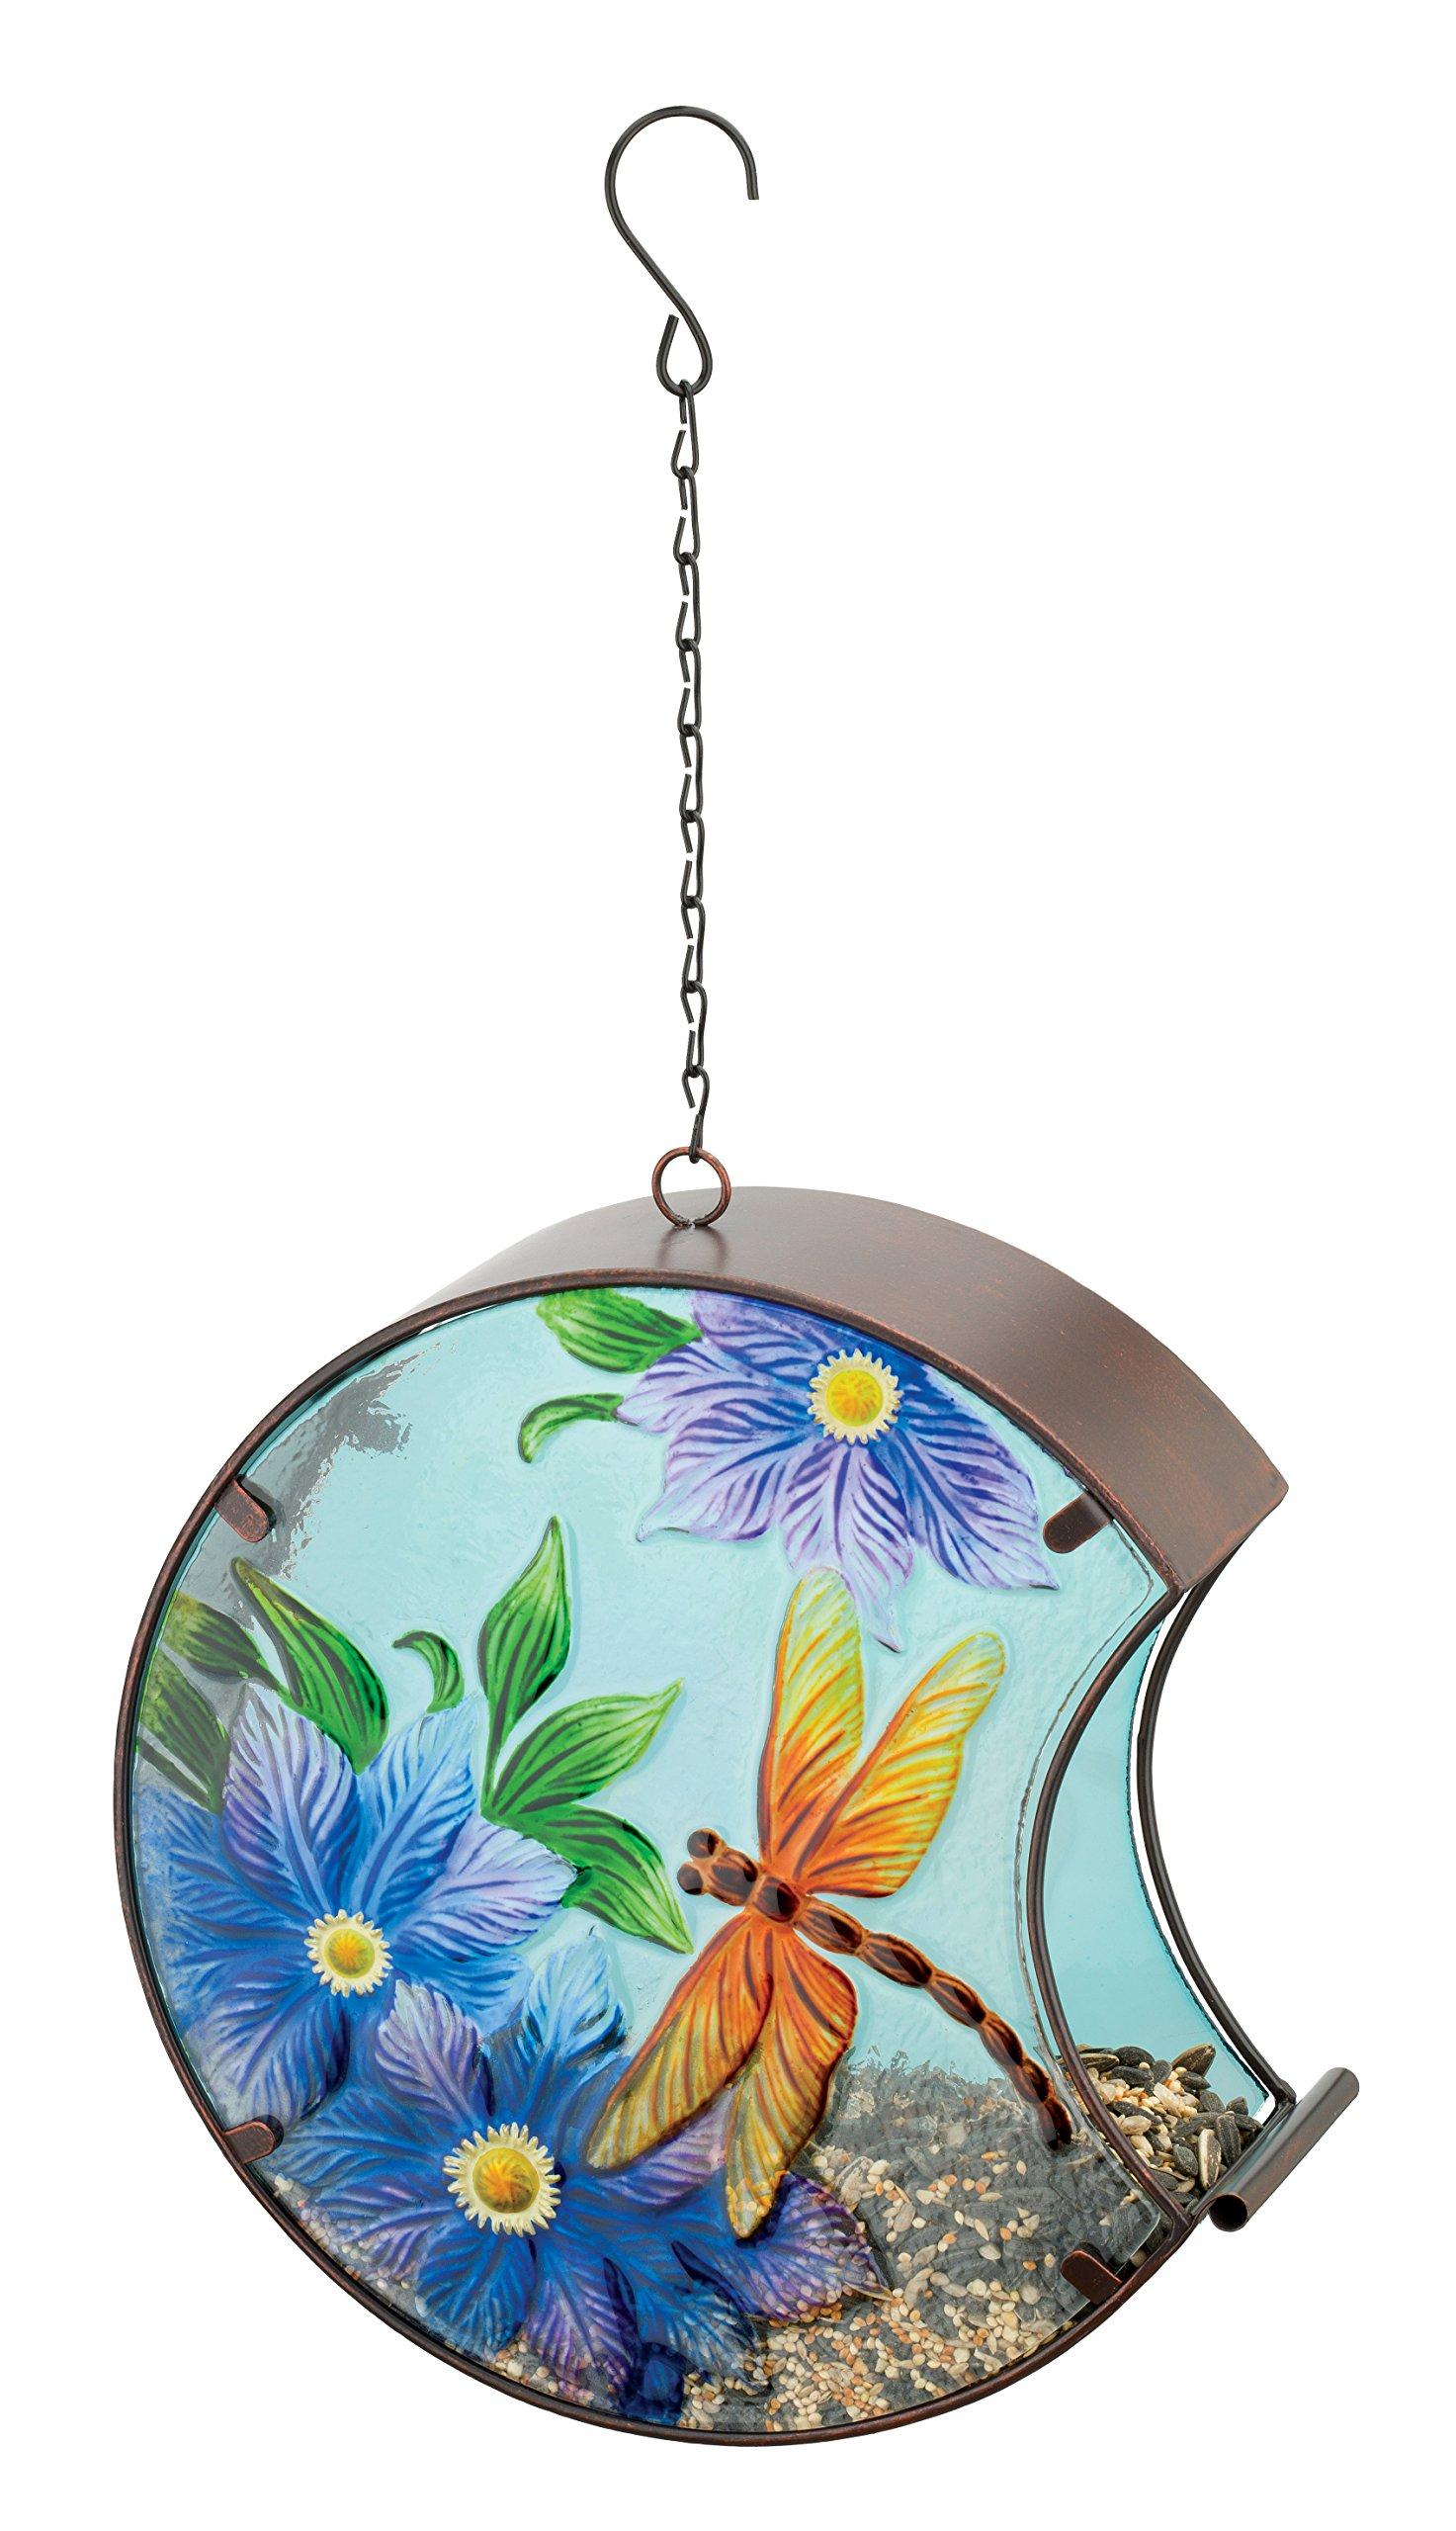 Regal Art & Gift 11687 Hand Painted Bird Feeder, Dragonfly